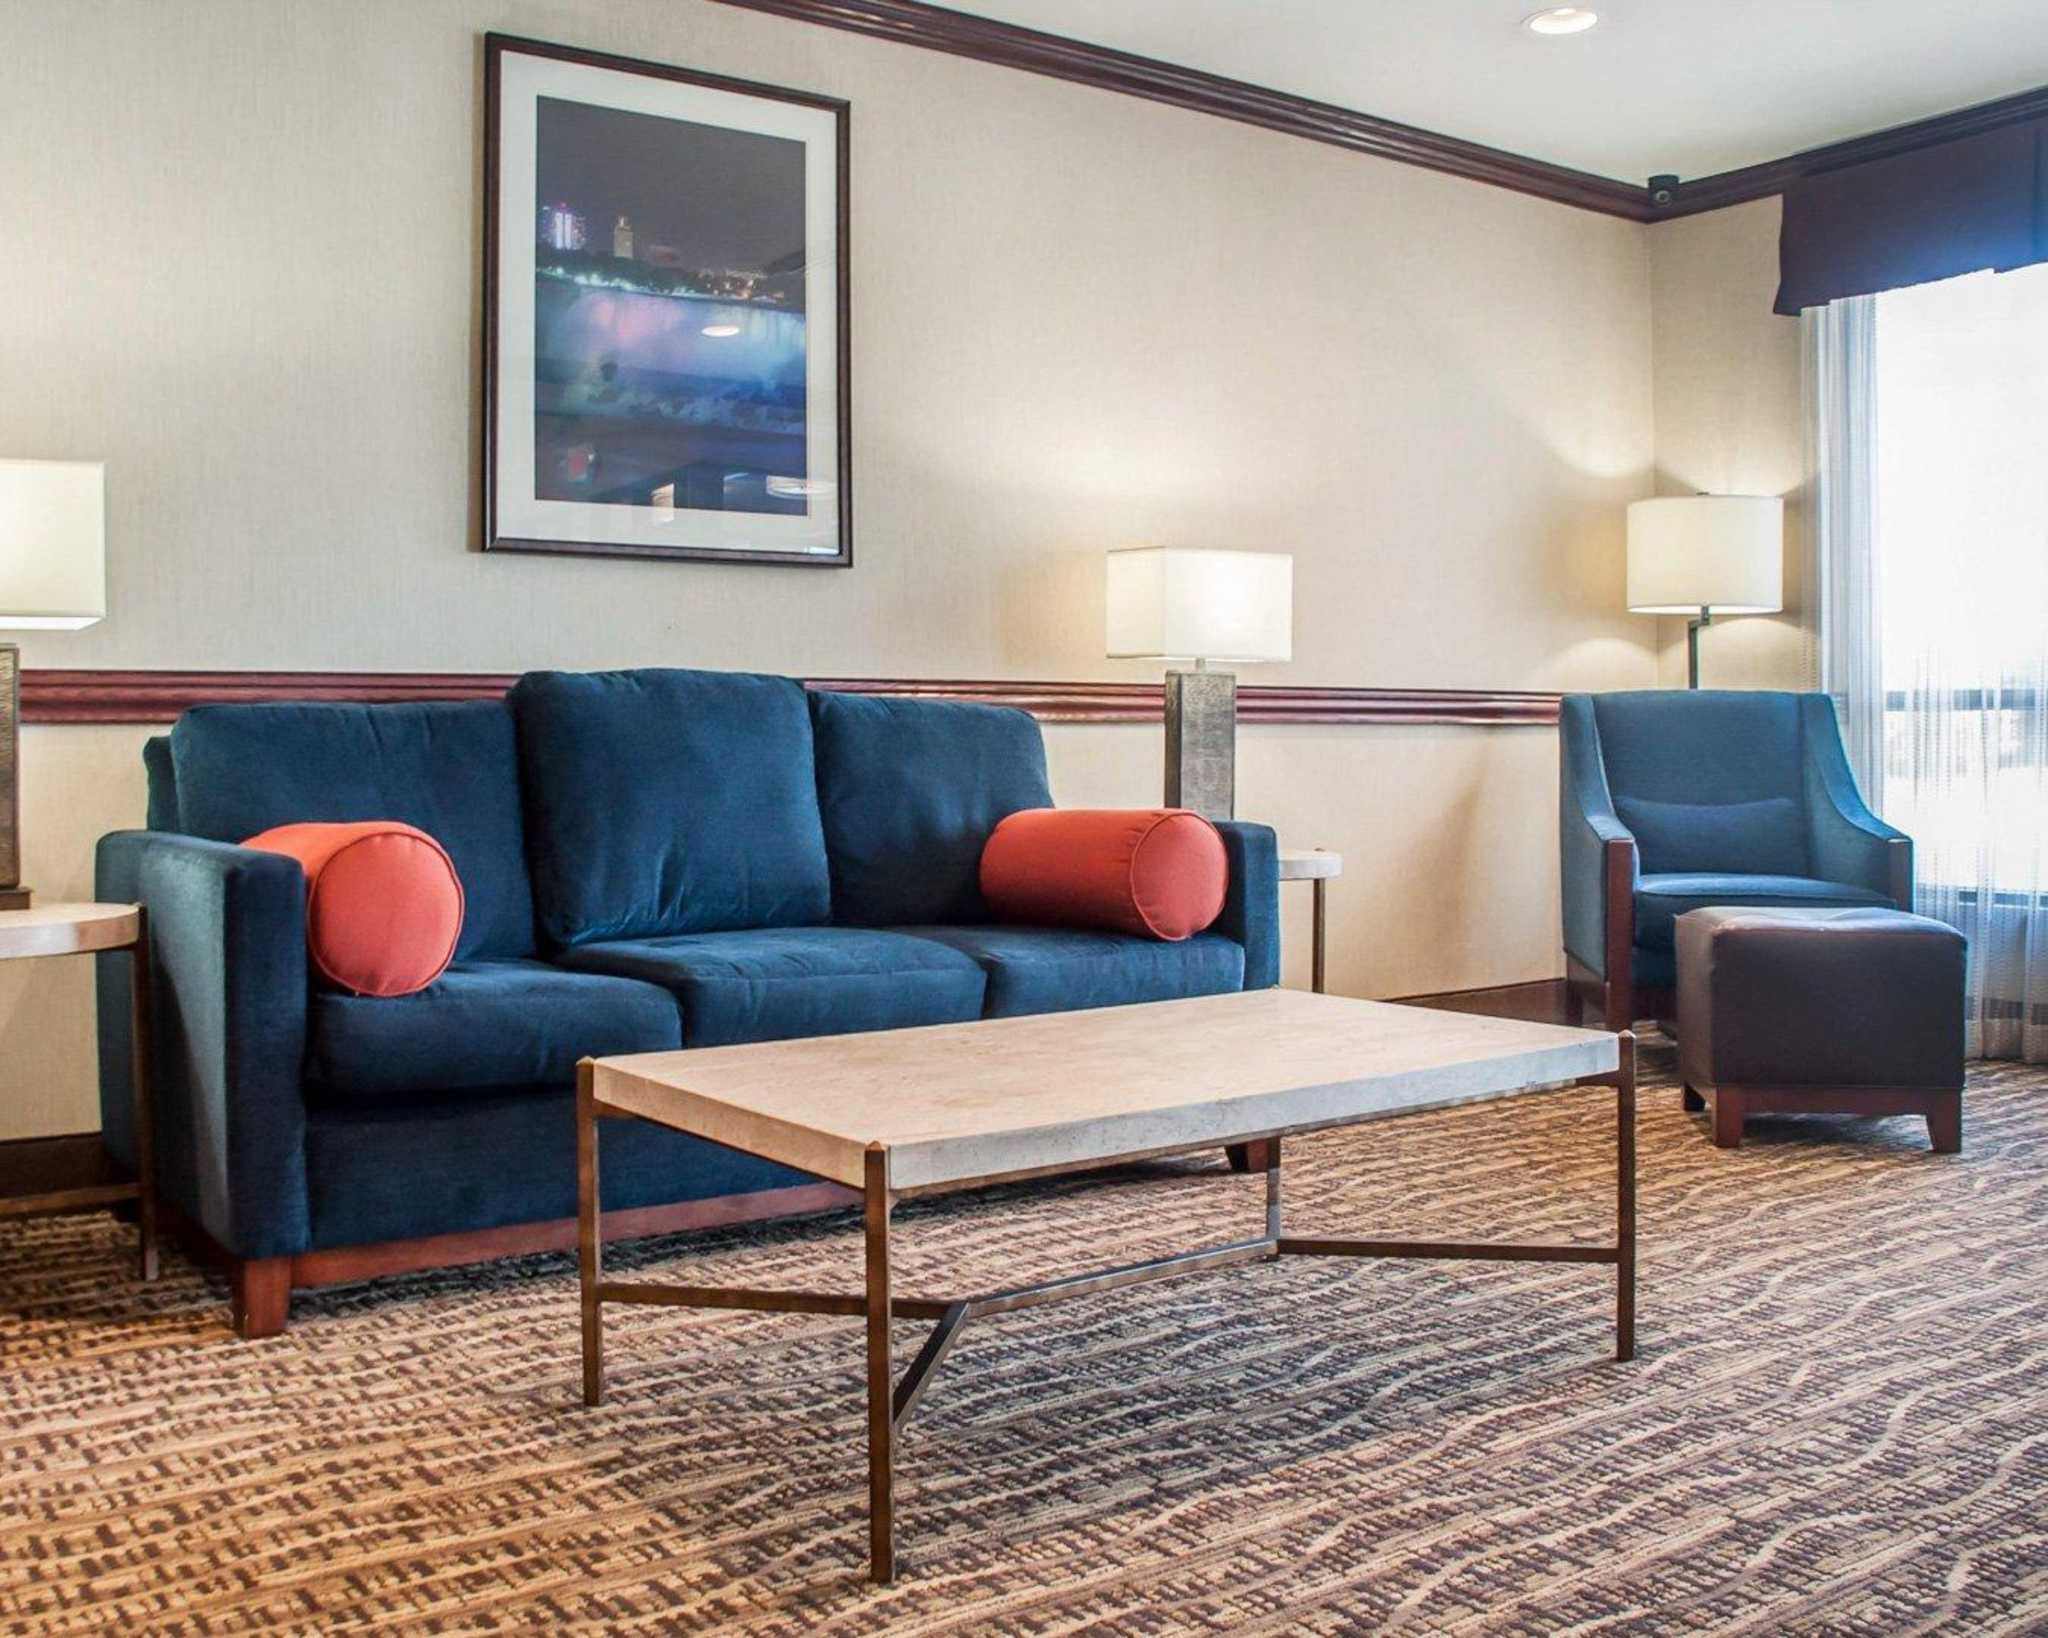 Comfort Inn Near Walden Galleria Mall image 22